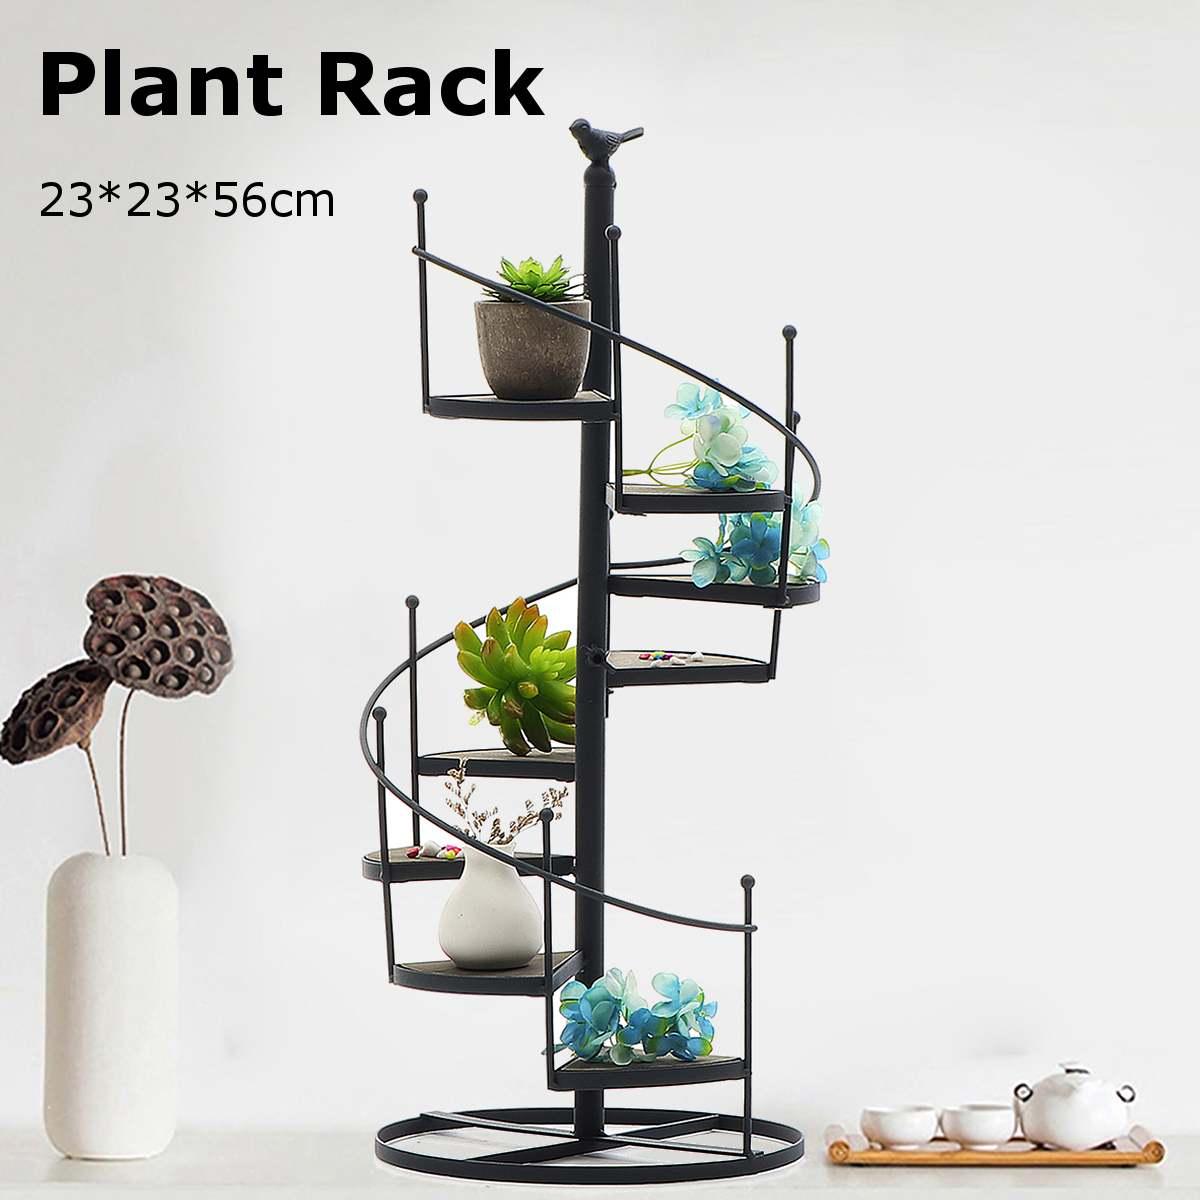 Modern Decorative Iron Plant Rack Stand Plants Succulent Shelf 8 Layer Stair Shape Desktop Garden Flower Stand + Wood Plate